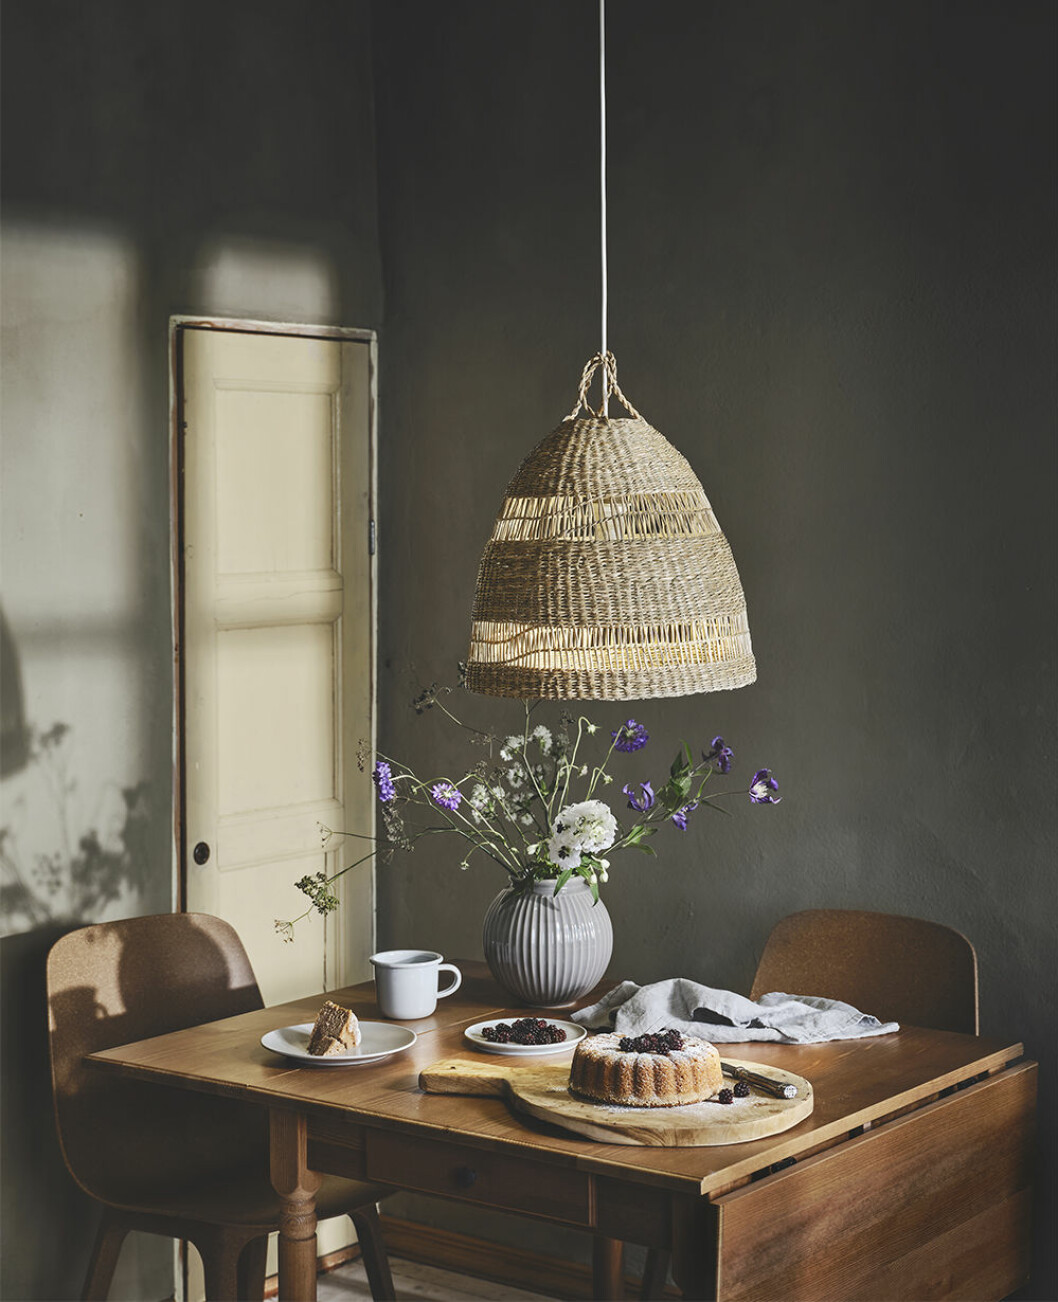 Lampa i naturmaterial från Ikea